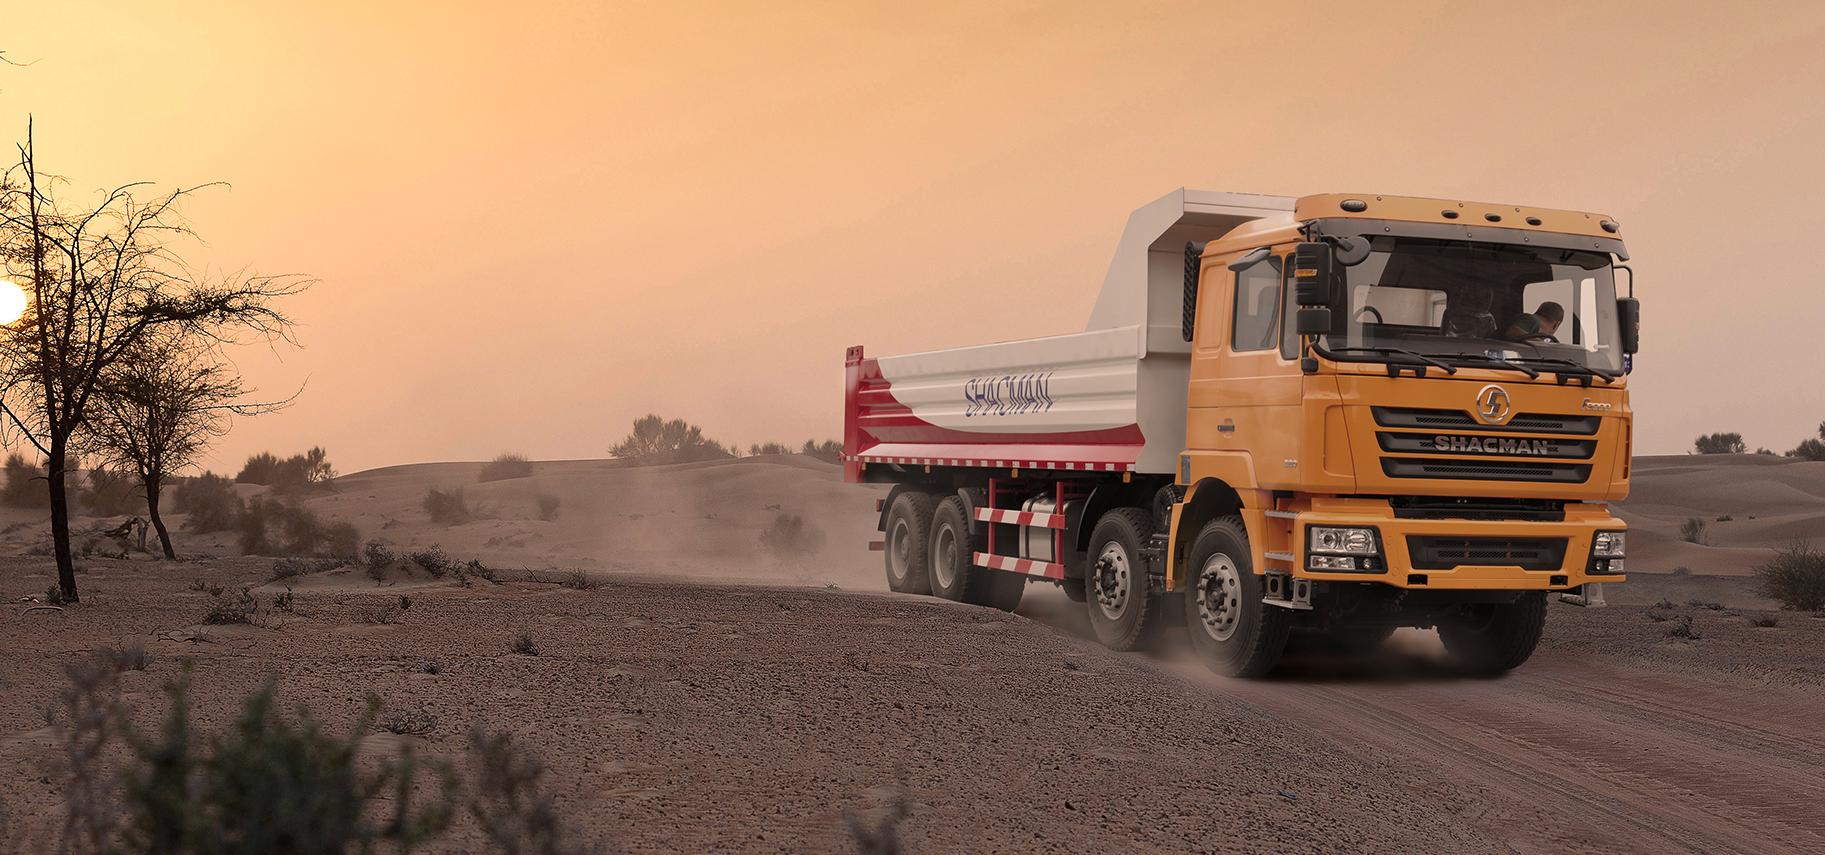 Shacman truck F3000